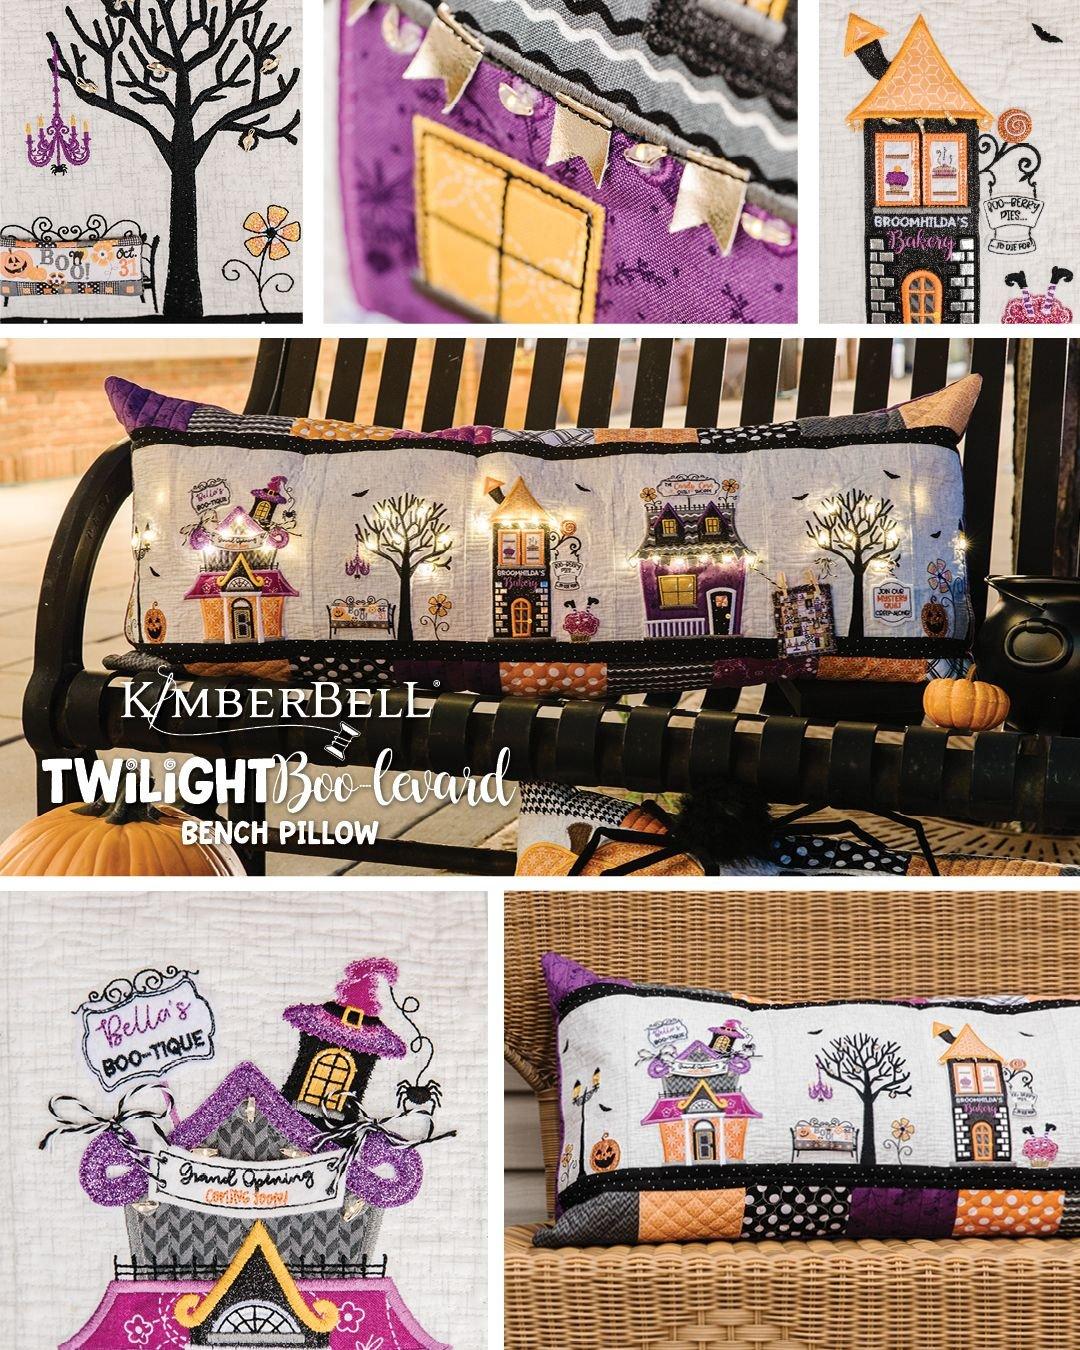 Kimberbell Twilight Boo-levard Bench Pillow Fabric Kit